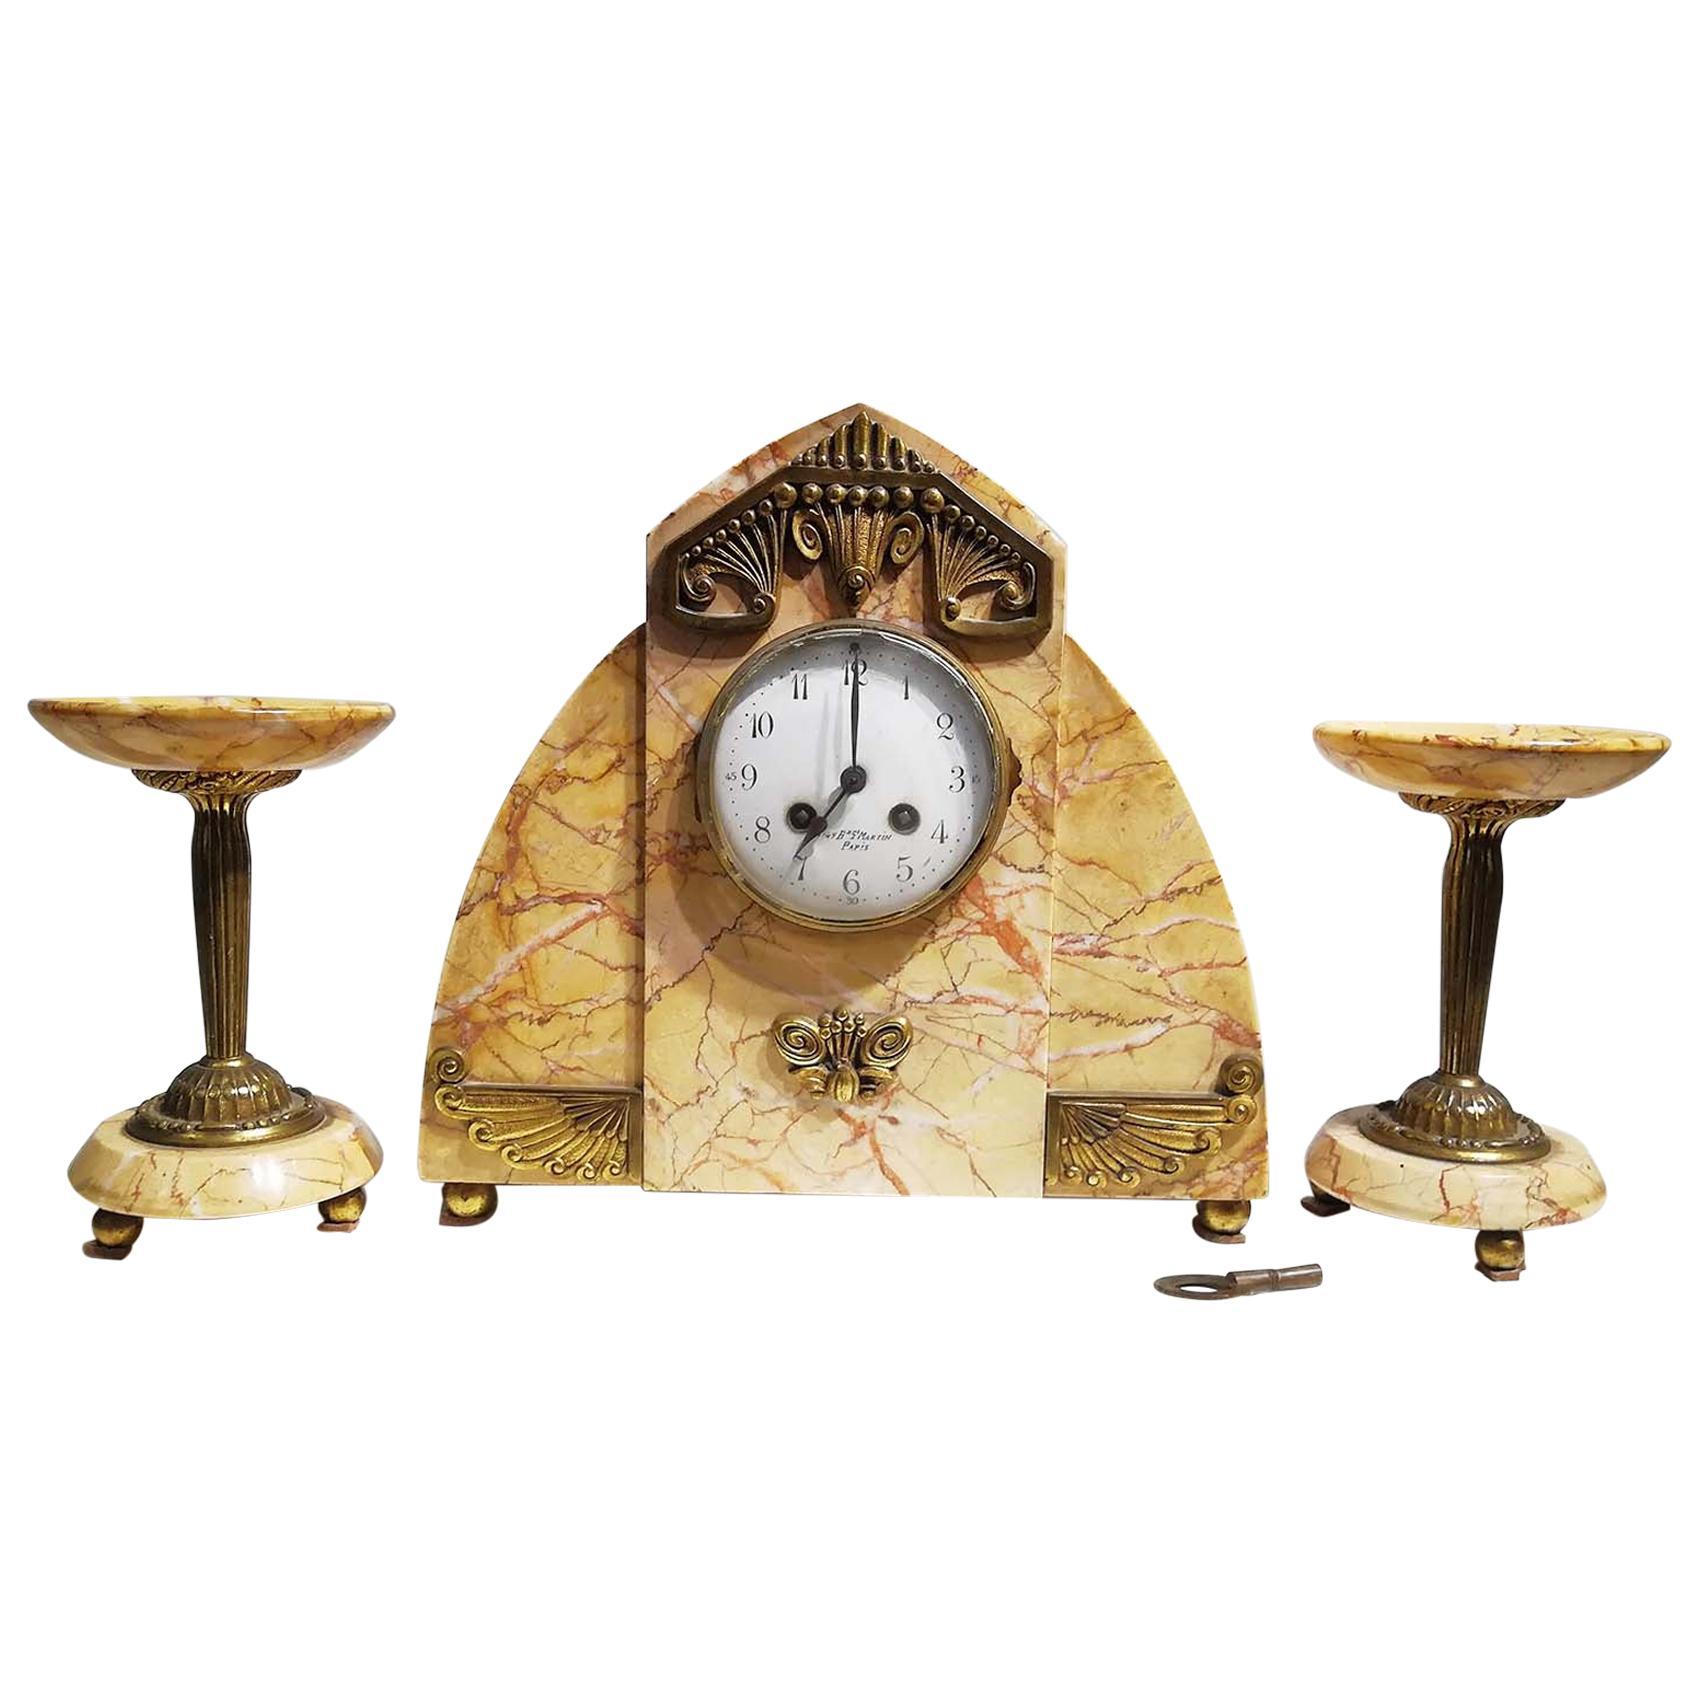 Marble and Gilt Bronze Clock Set, Signed Bonnet and Pottier, France, 1930